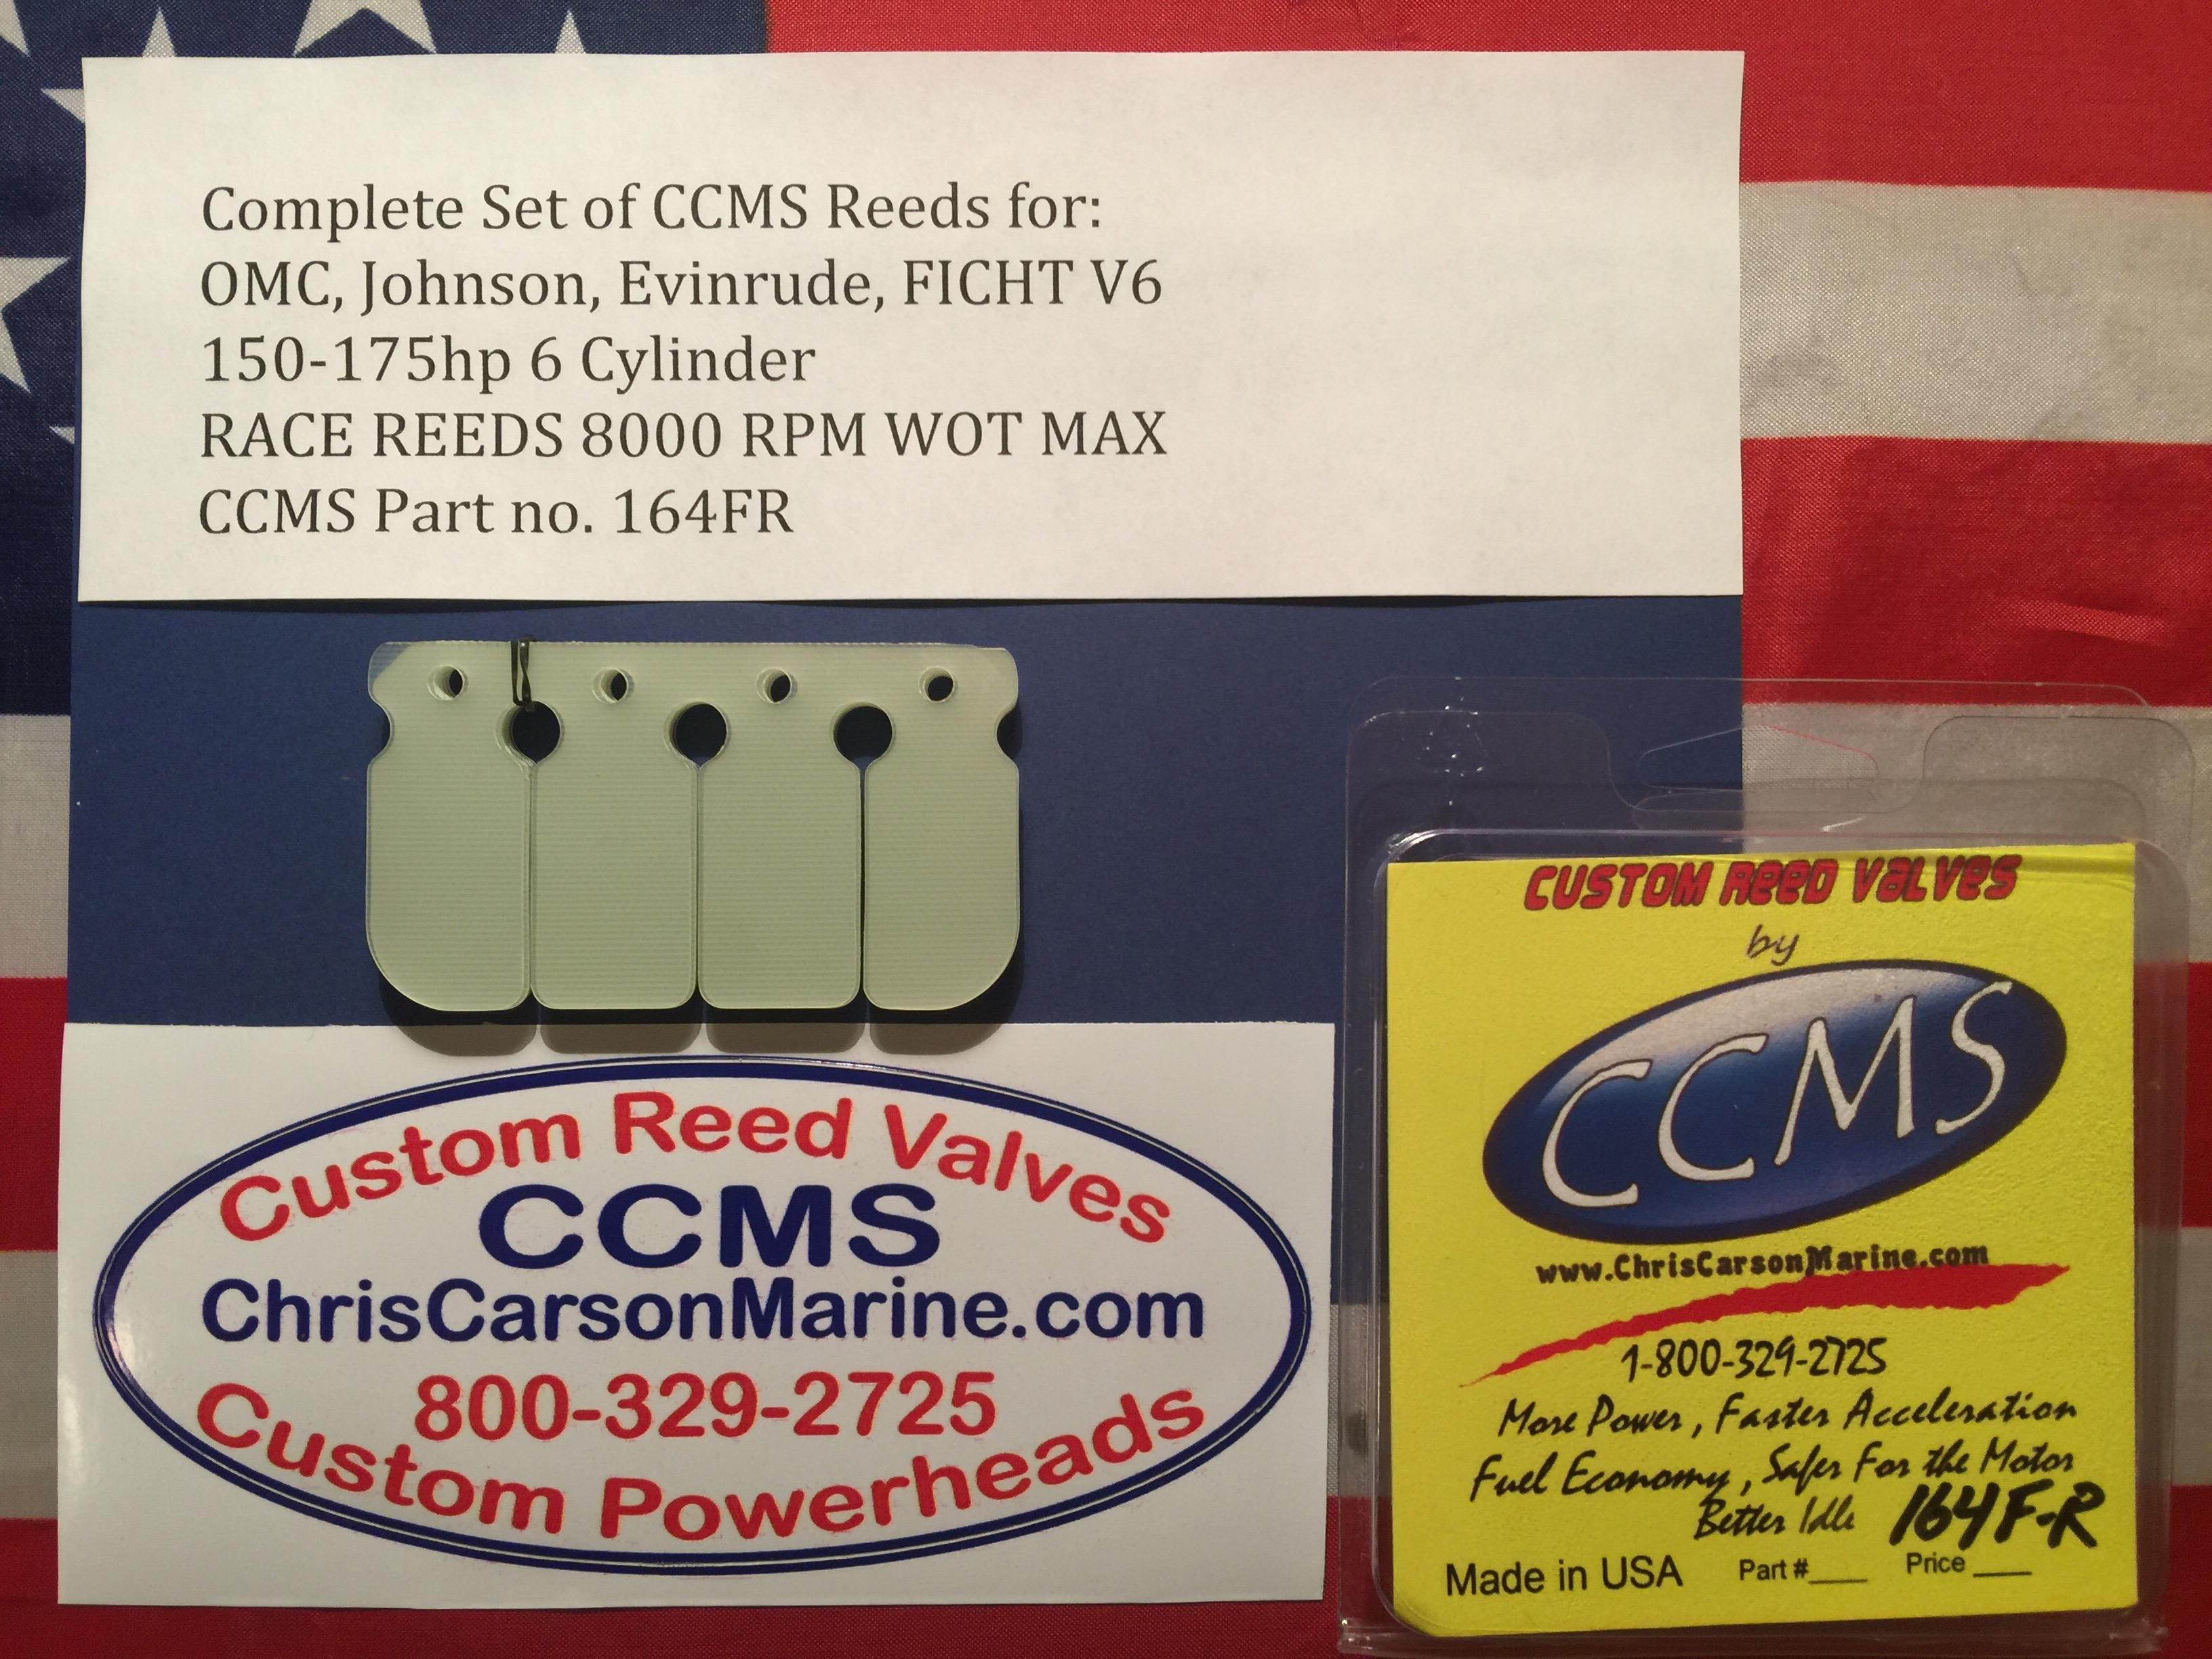 CCMS OMC/Johnson/Evinrude Race Reed Valves V6 Ficht 150-175hp  6 cylinder  Part no  164FR